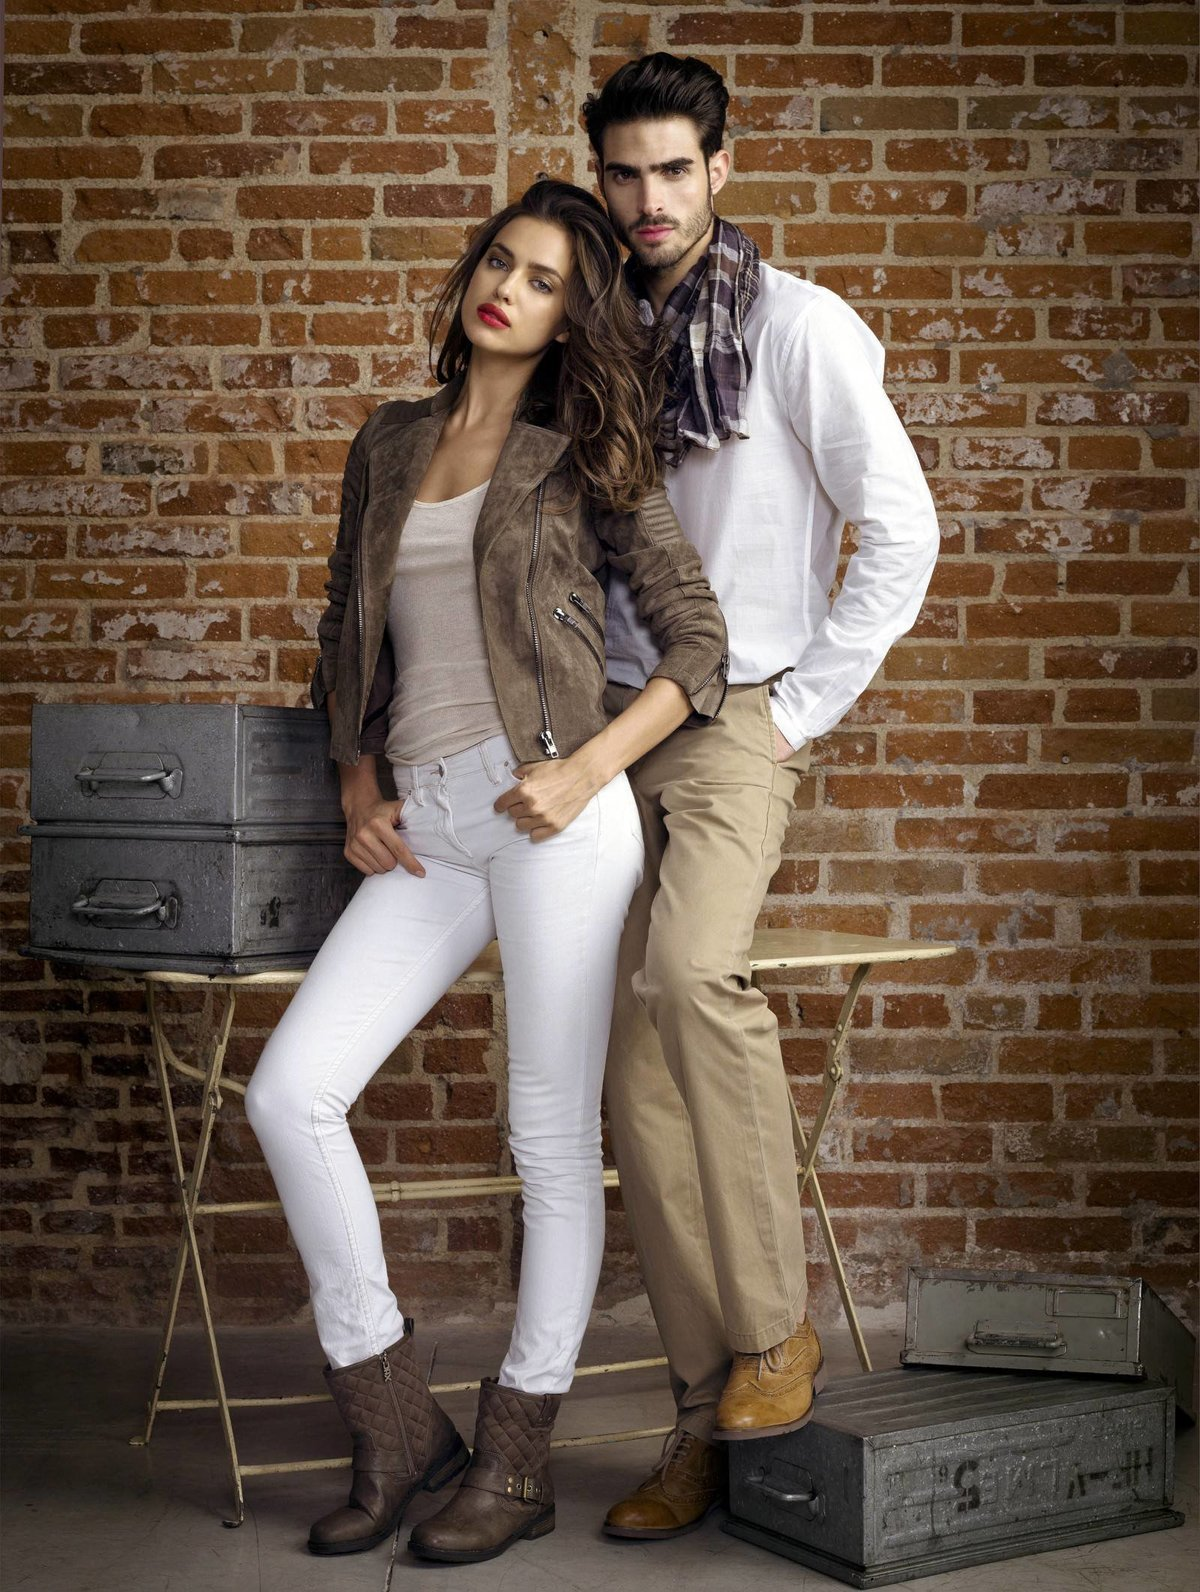 Мужчина и женщина картинки одежда